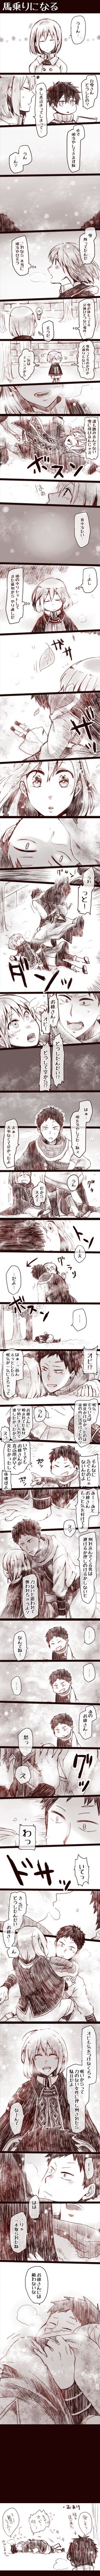 Shirayuki and Obi